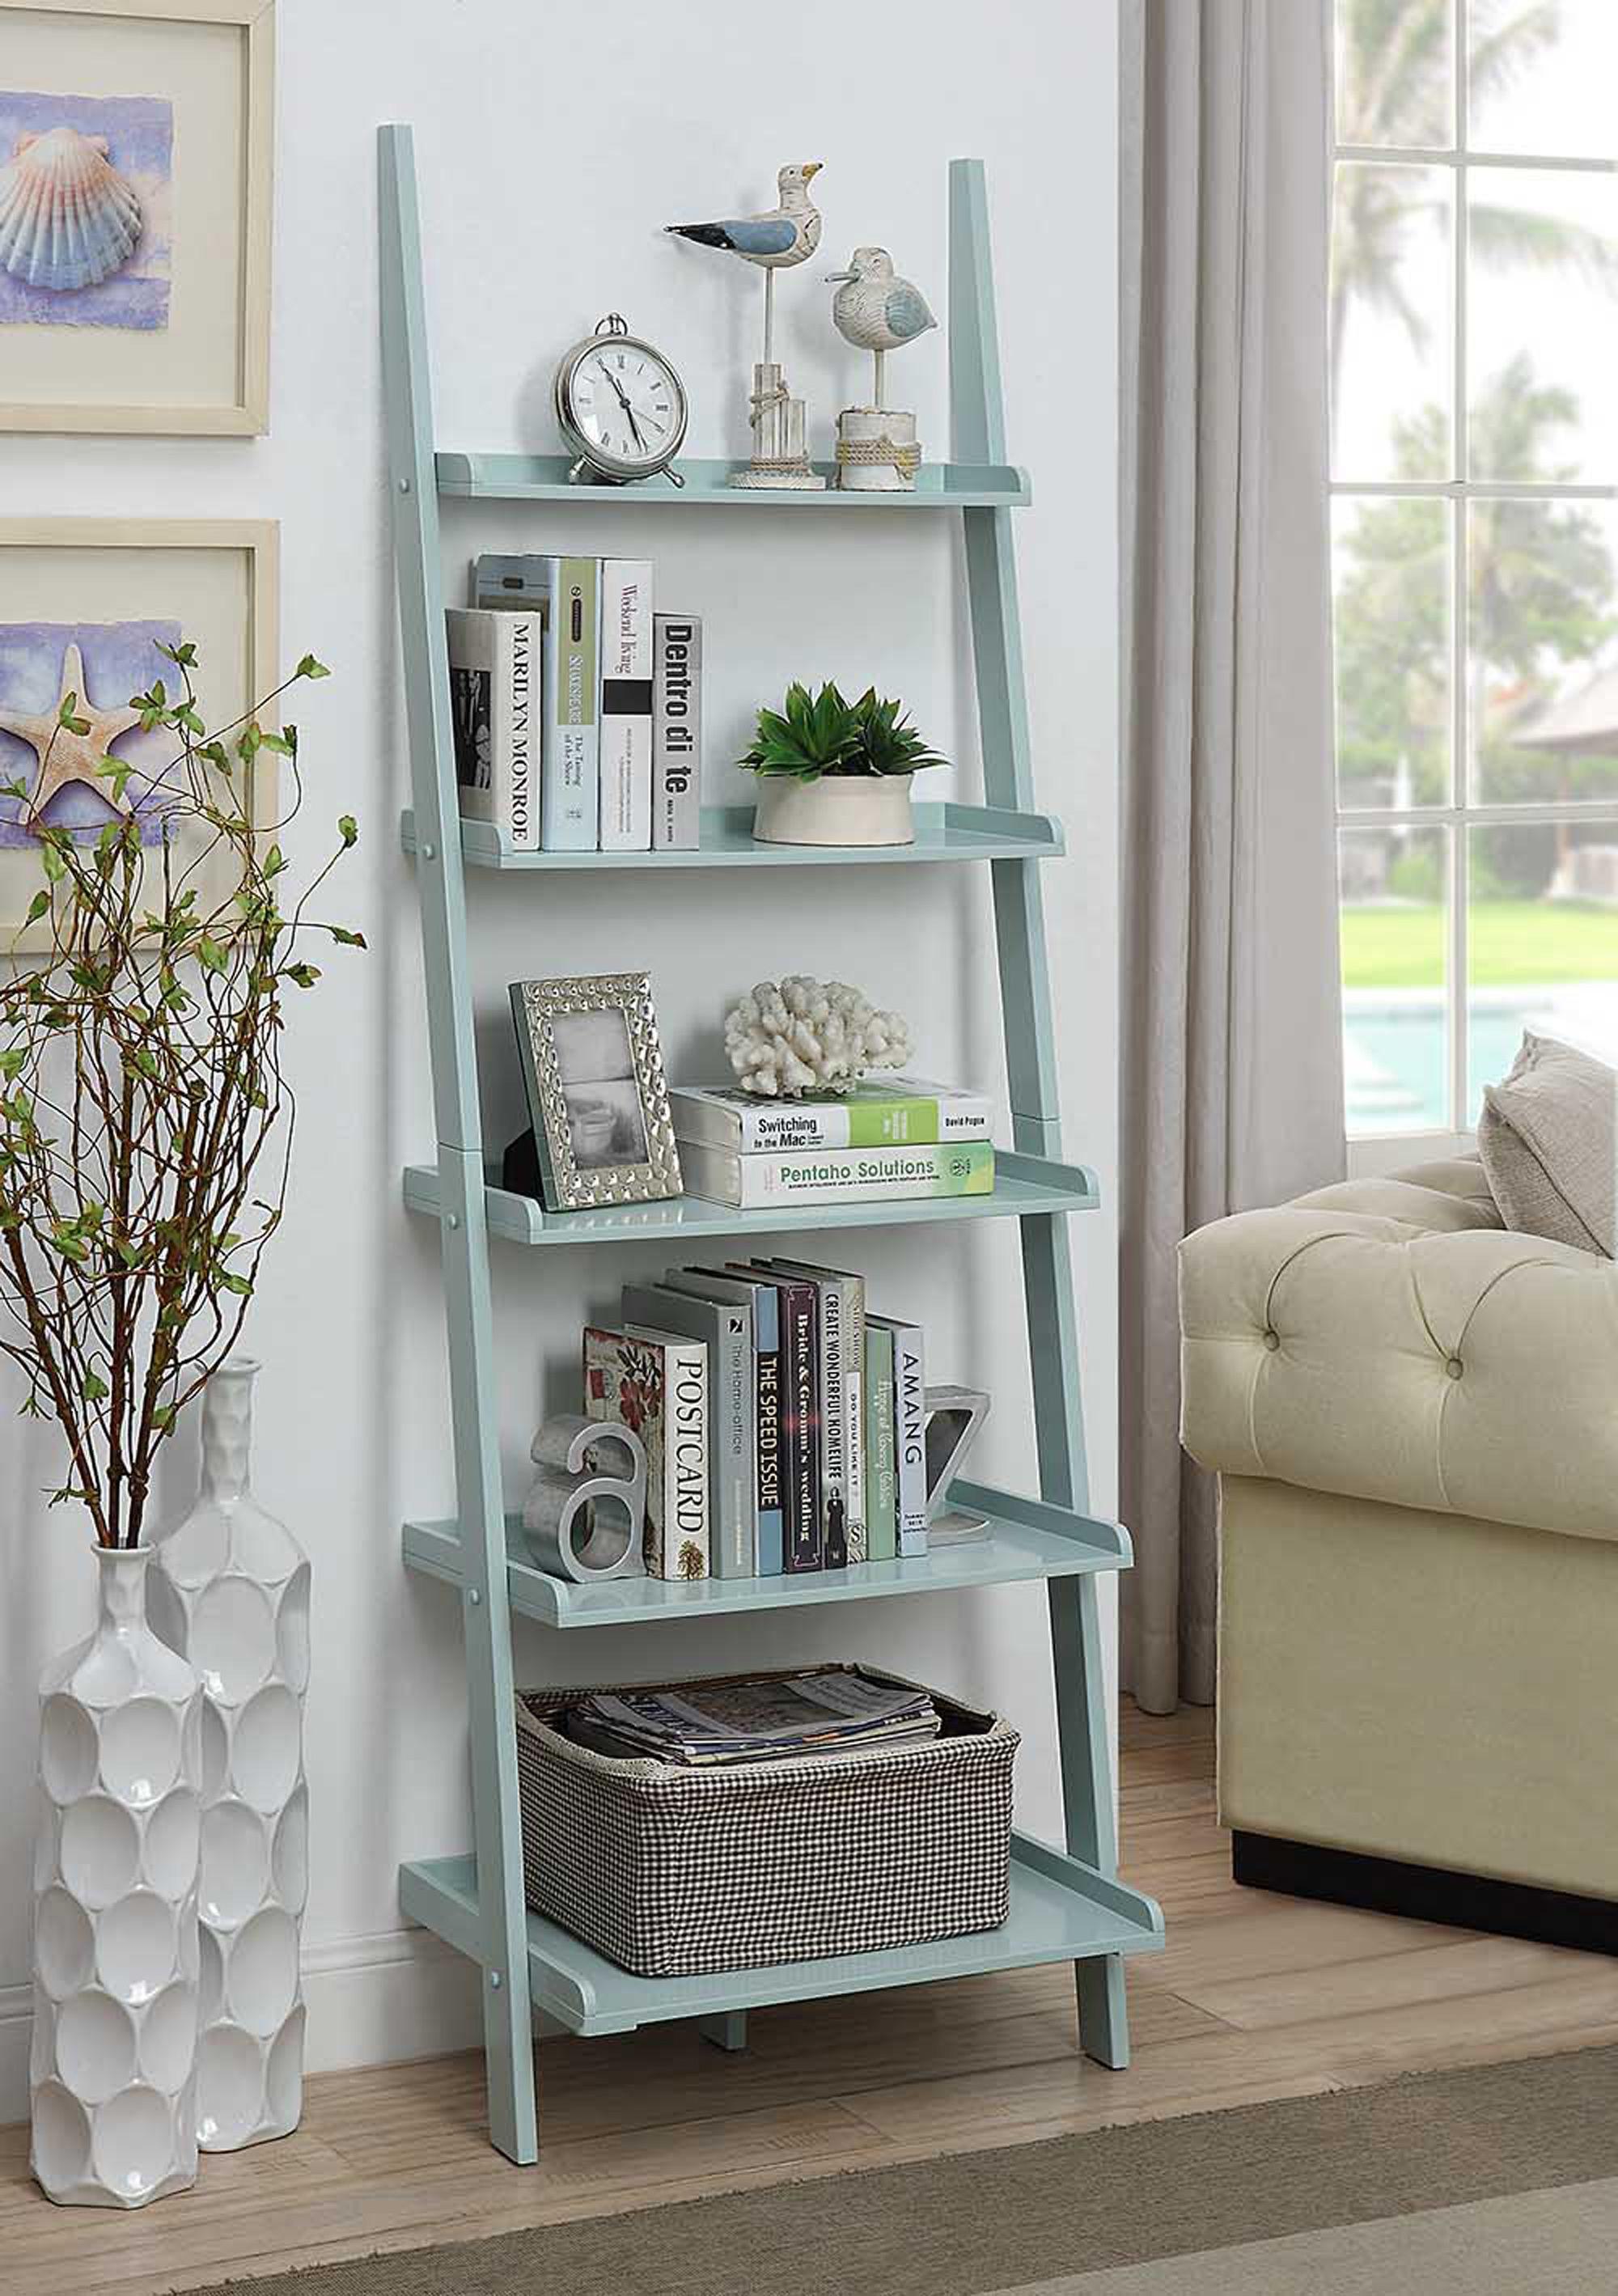 Pin By Alicia Rodriguez On Shelves In 2021 Shelf Decor Living Room Bookcase Decor Living Room Decor Bedroom decor ladder shelf